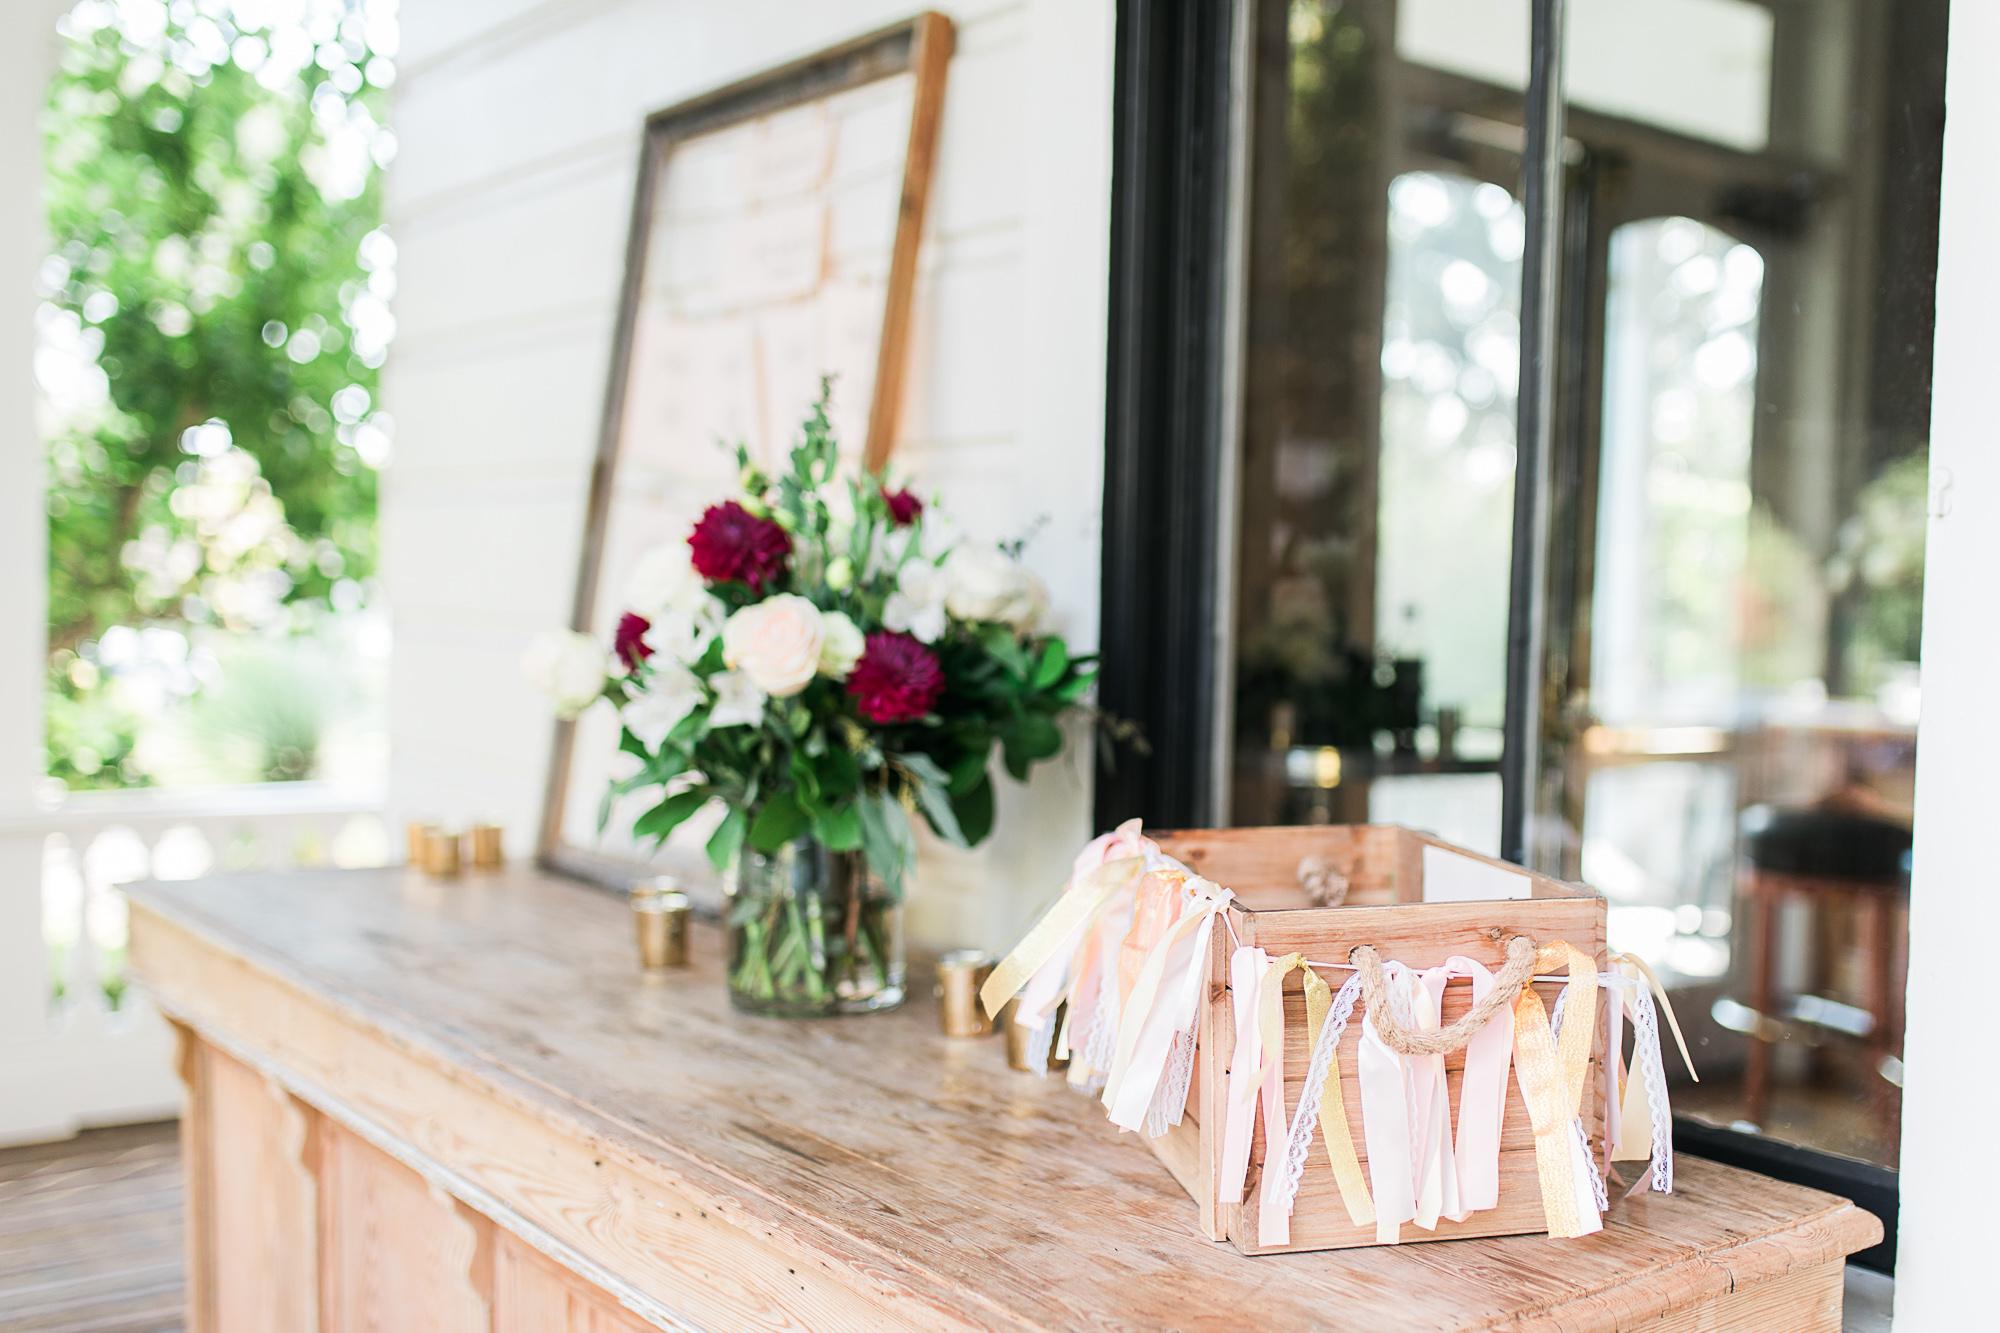 Generals+Daughter+Wedding+Photos+by+JBJ+Pictures+-+Ramekins+Wedding+Venue+Photographer+in+Sonoma+Napa+(20).jpg